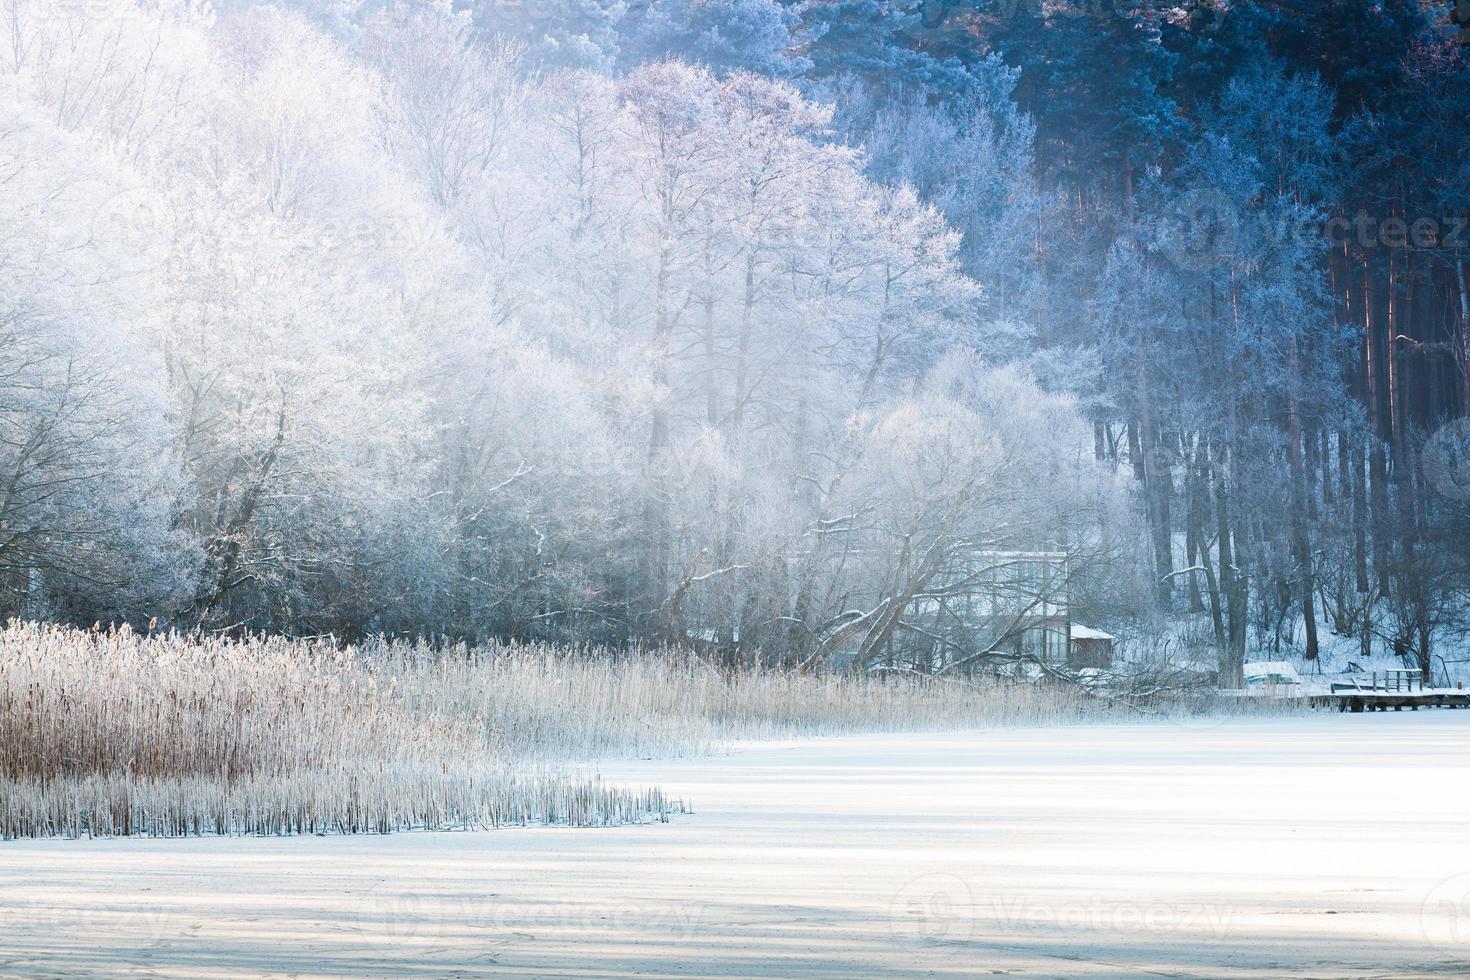 lago de inverno foto